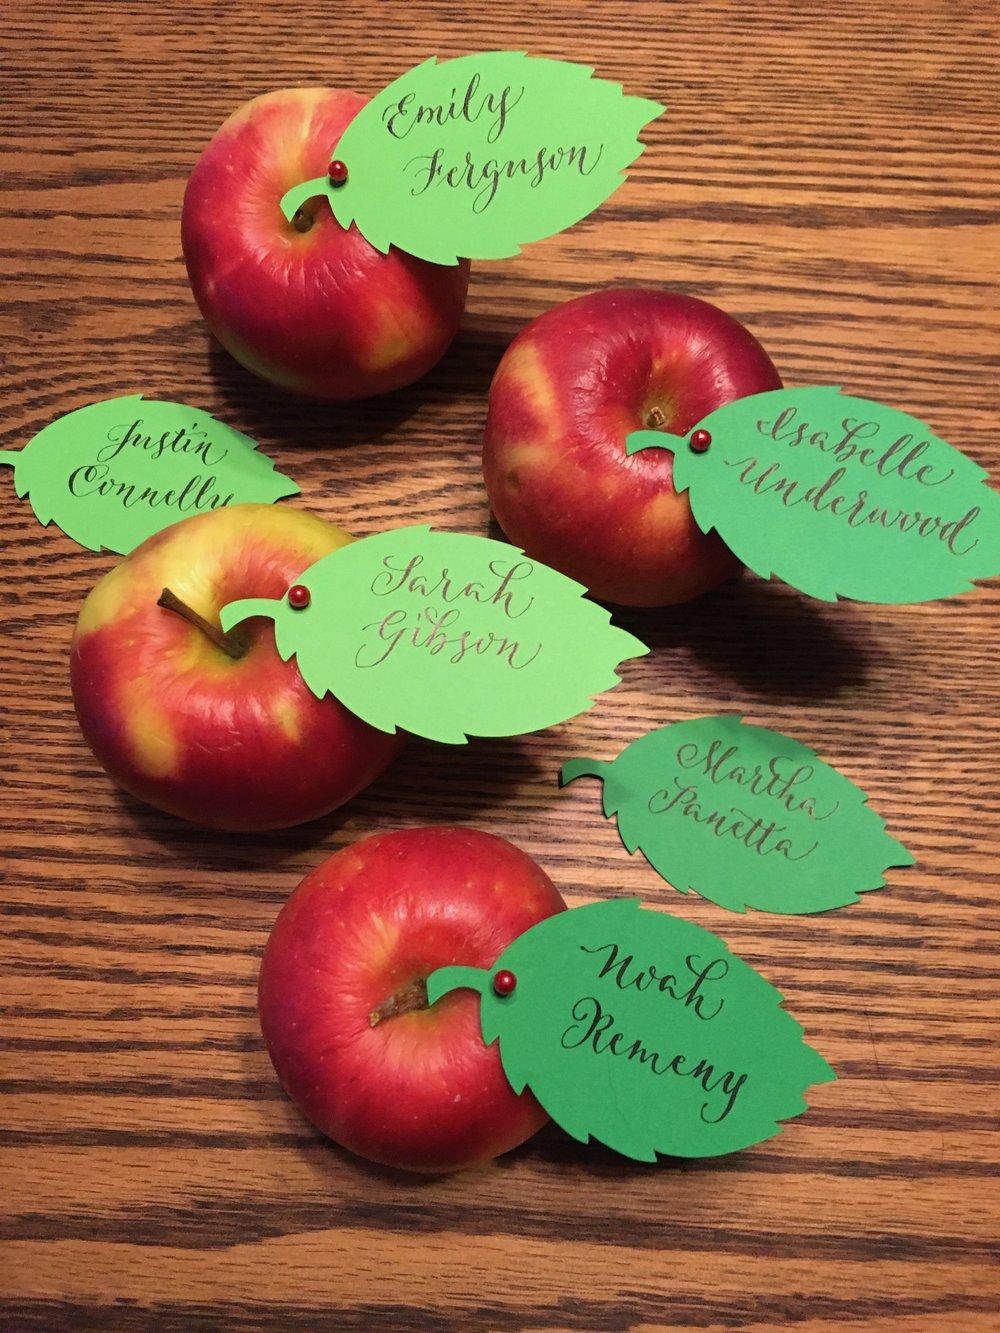 Apple place cards.jpg